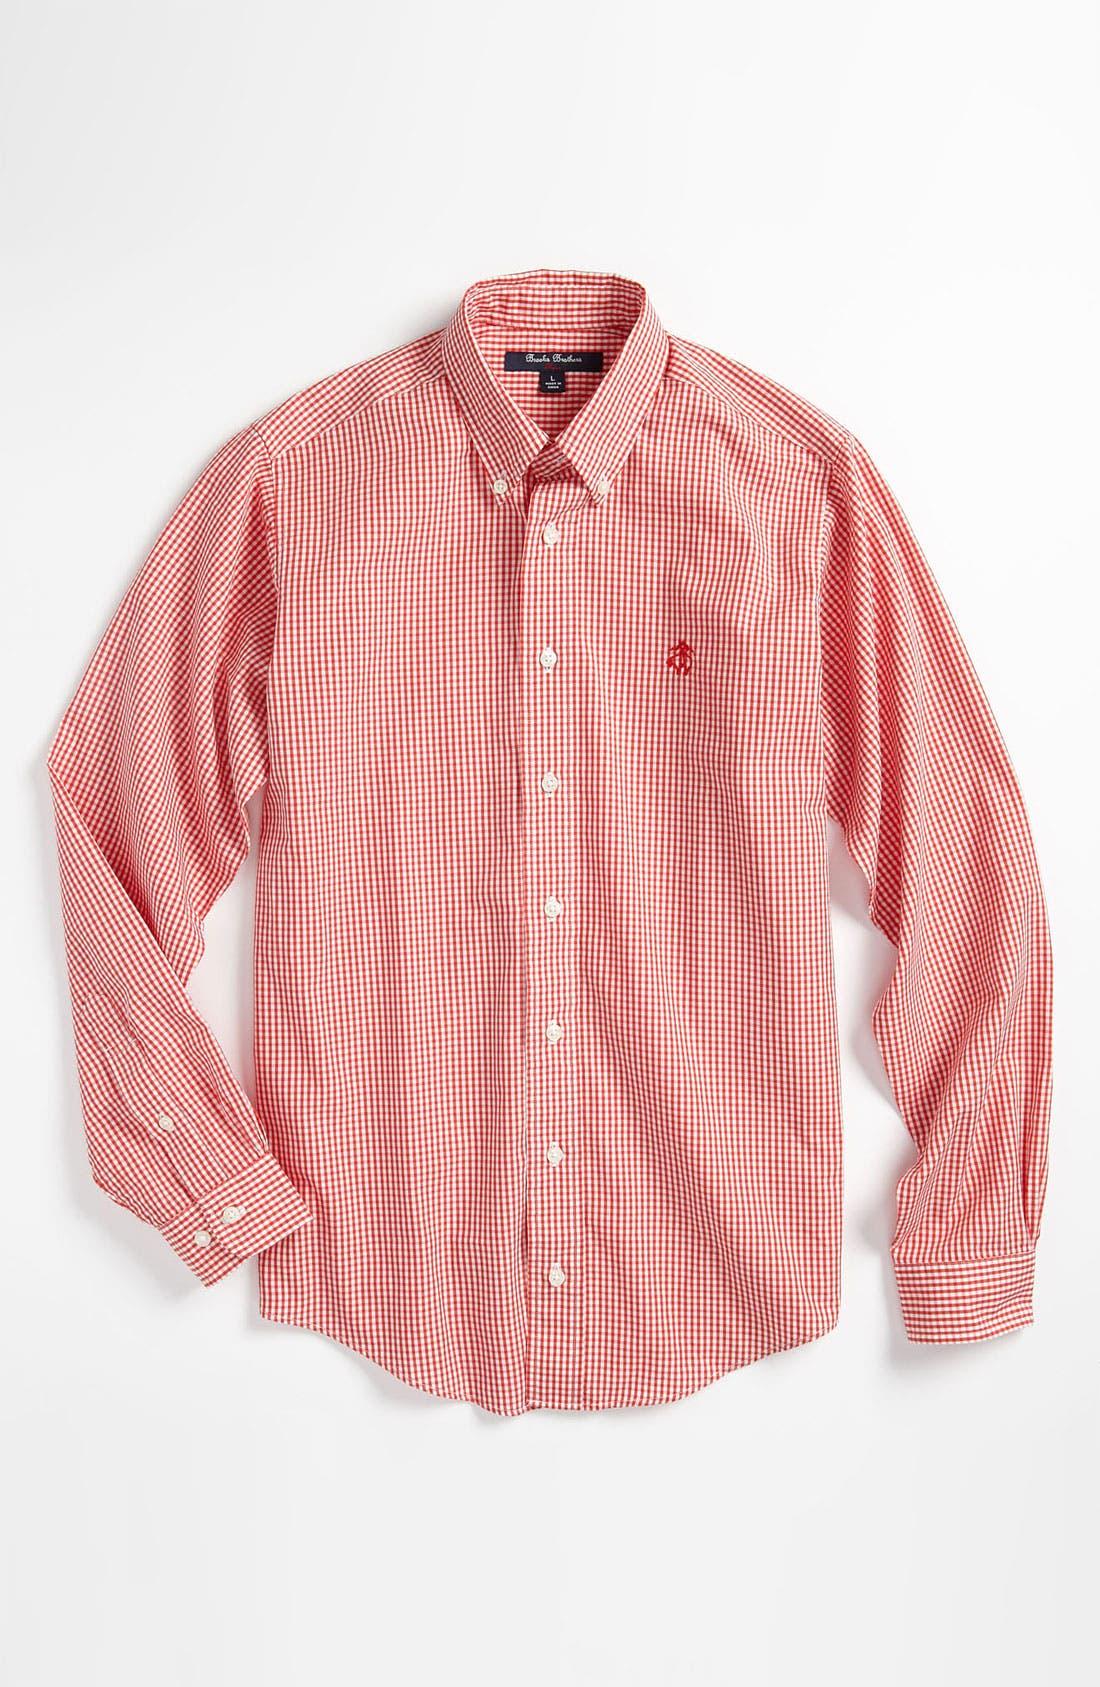 Alternate Image 1 Selected - Brooks Brothers Sport Shirt (Big Boys)